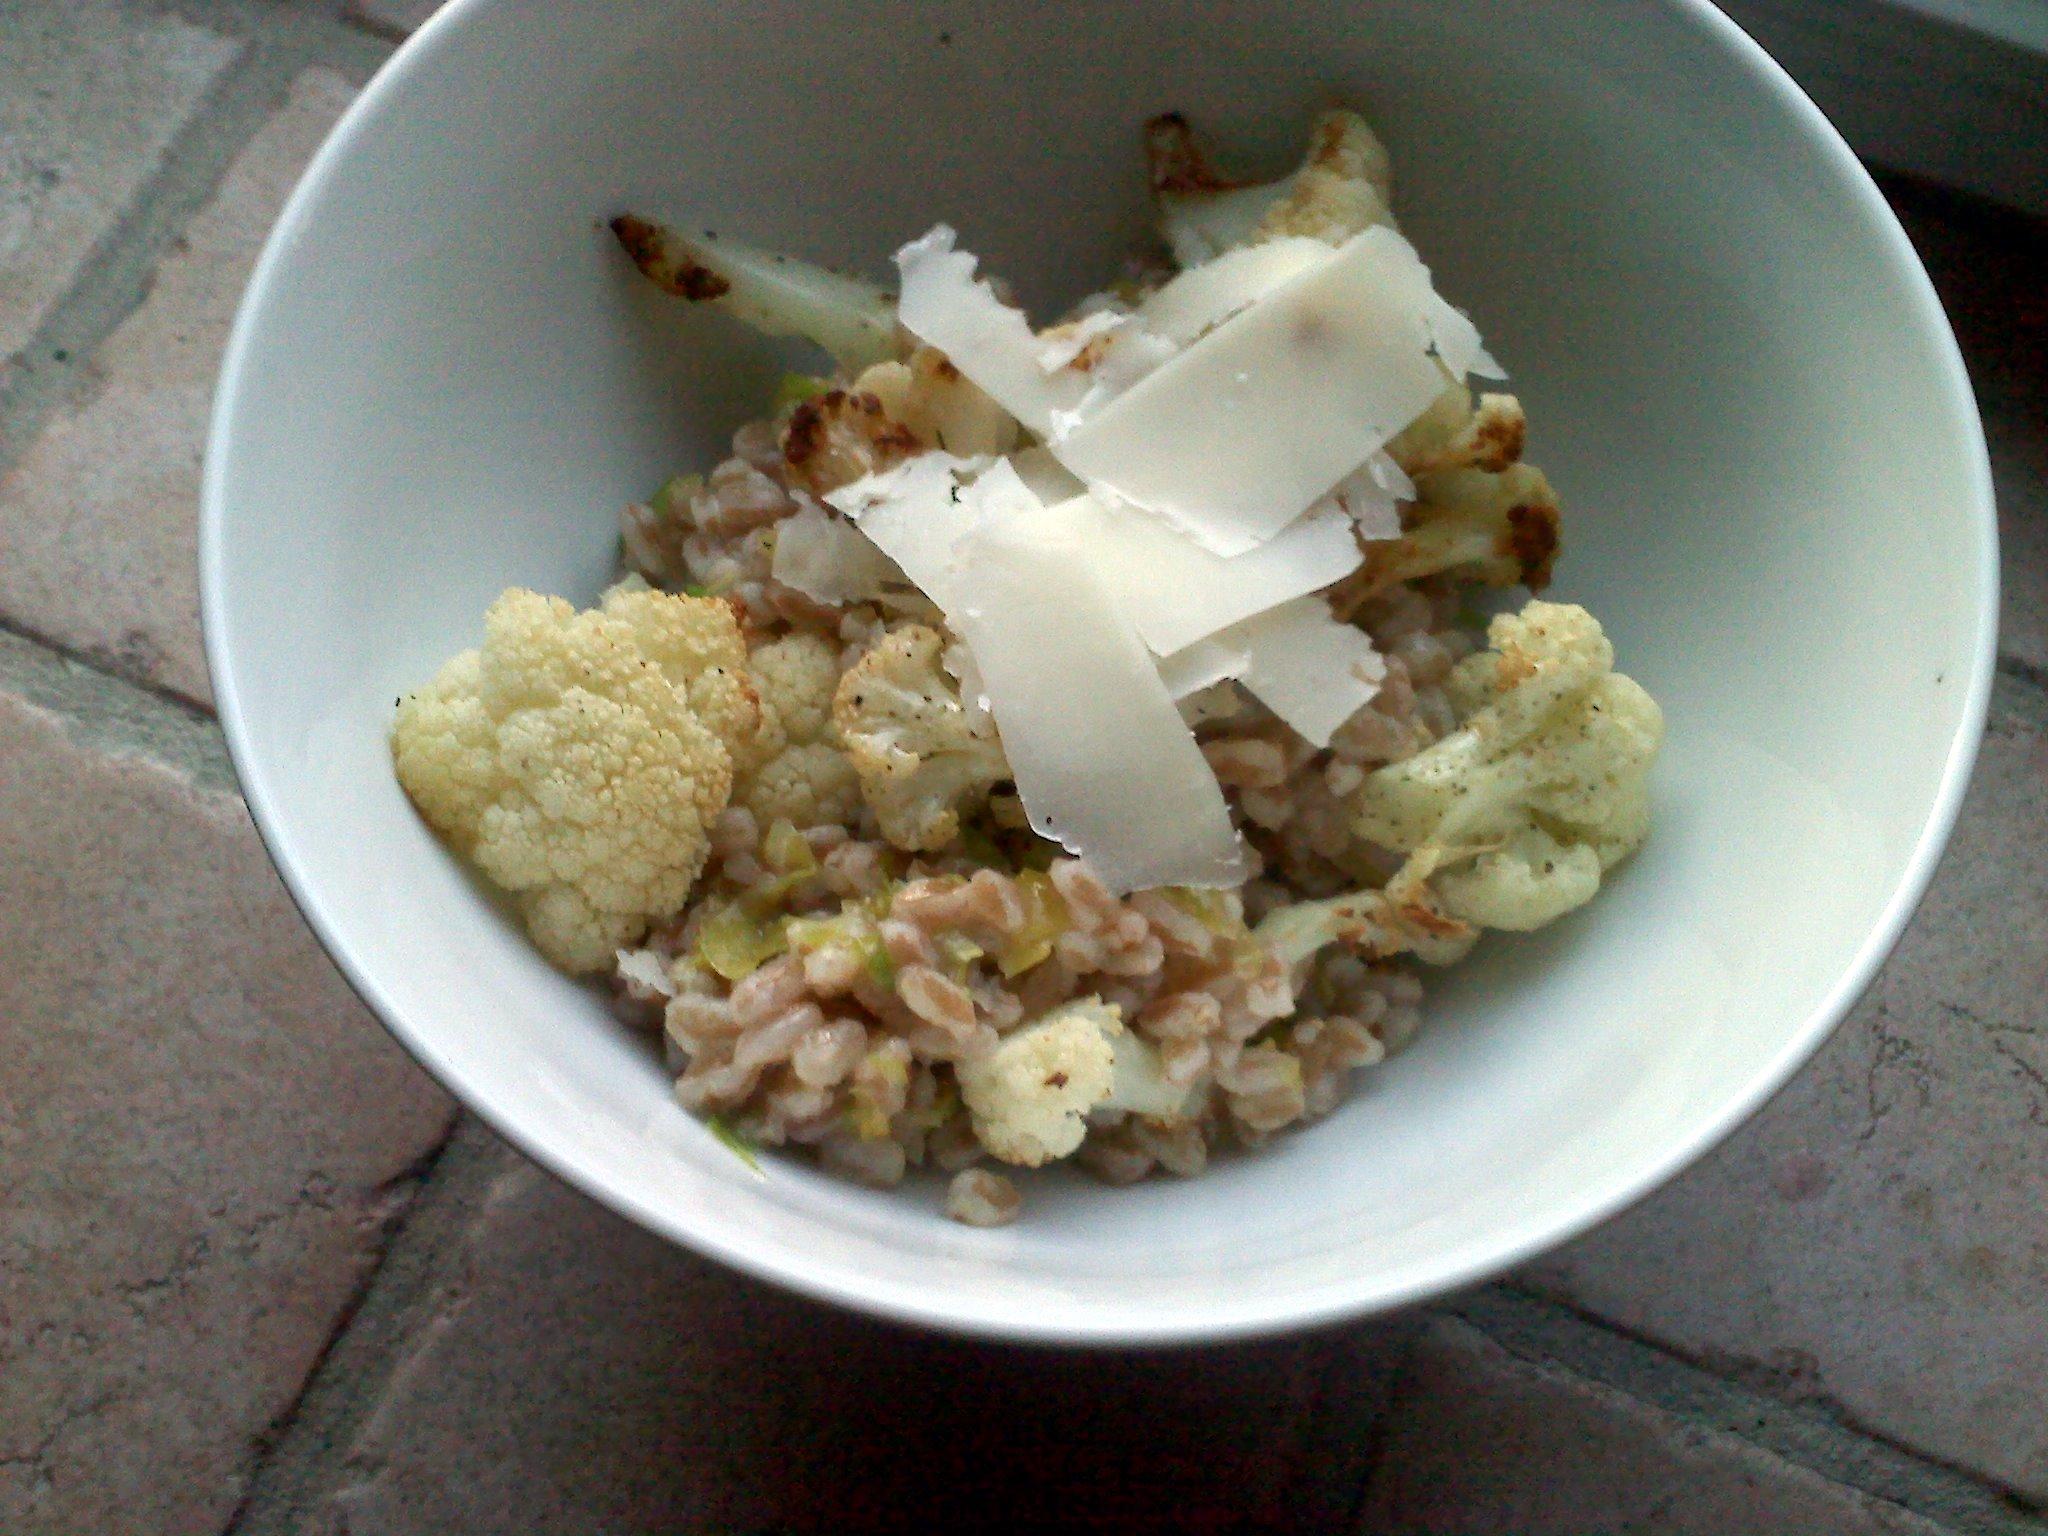 Roasted Cauliflower With Truffled Farro (Emmer Wheat)